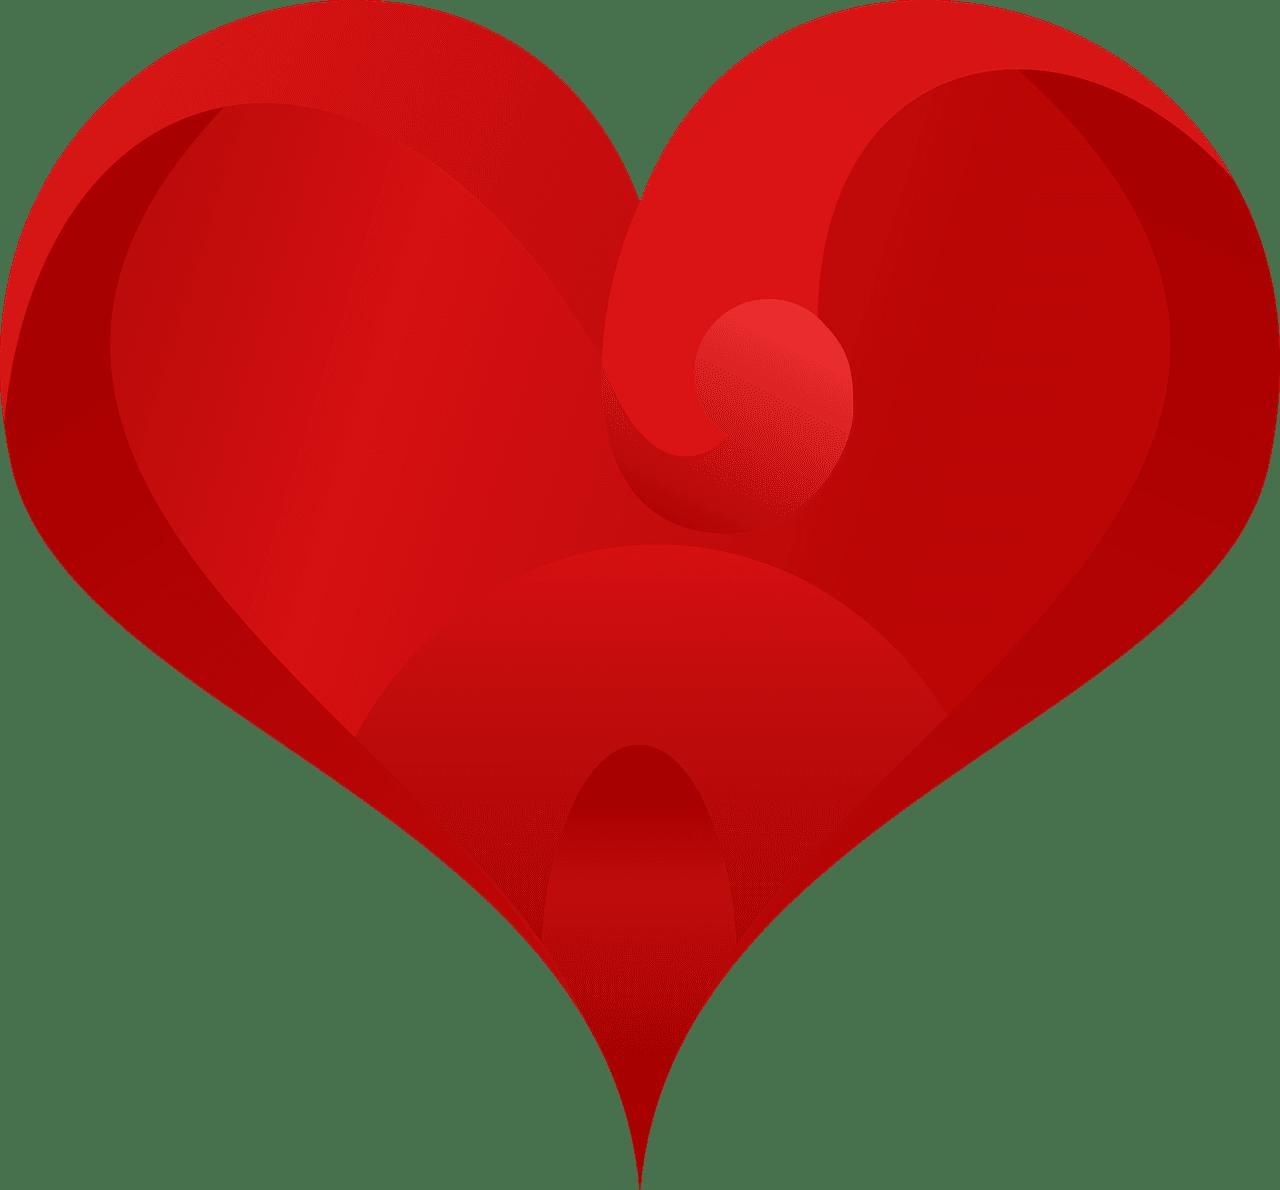 heart-1088487_1280 (2)